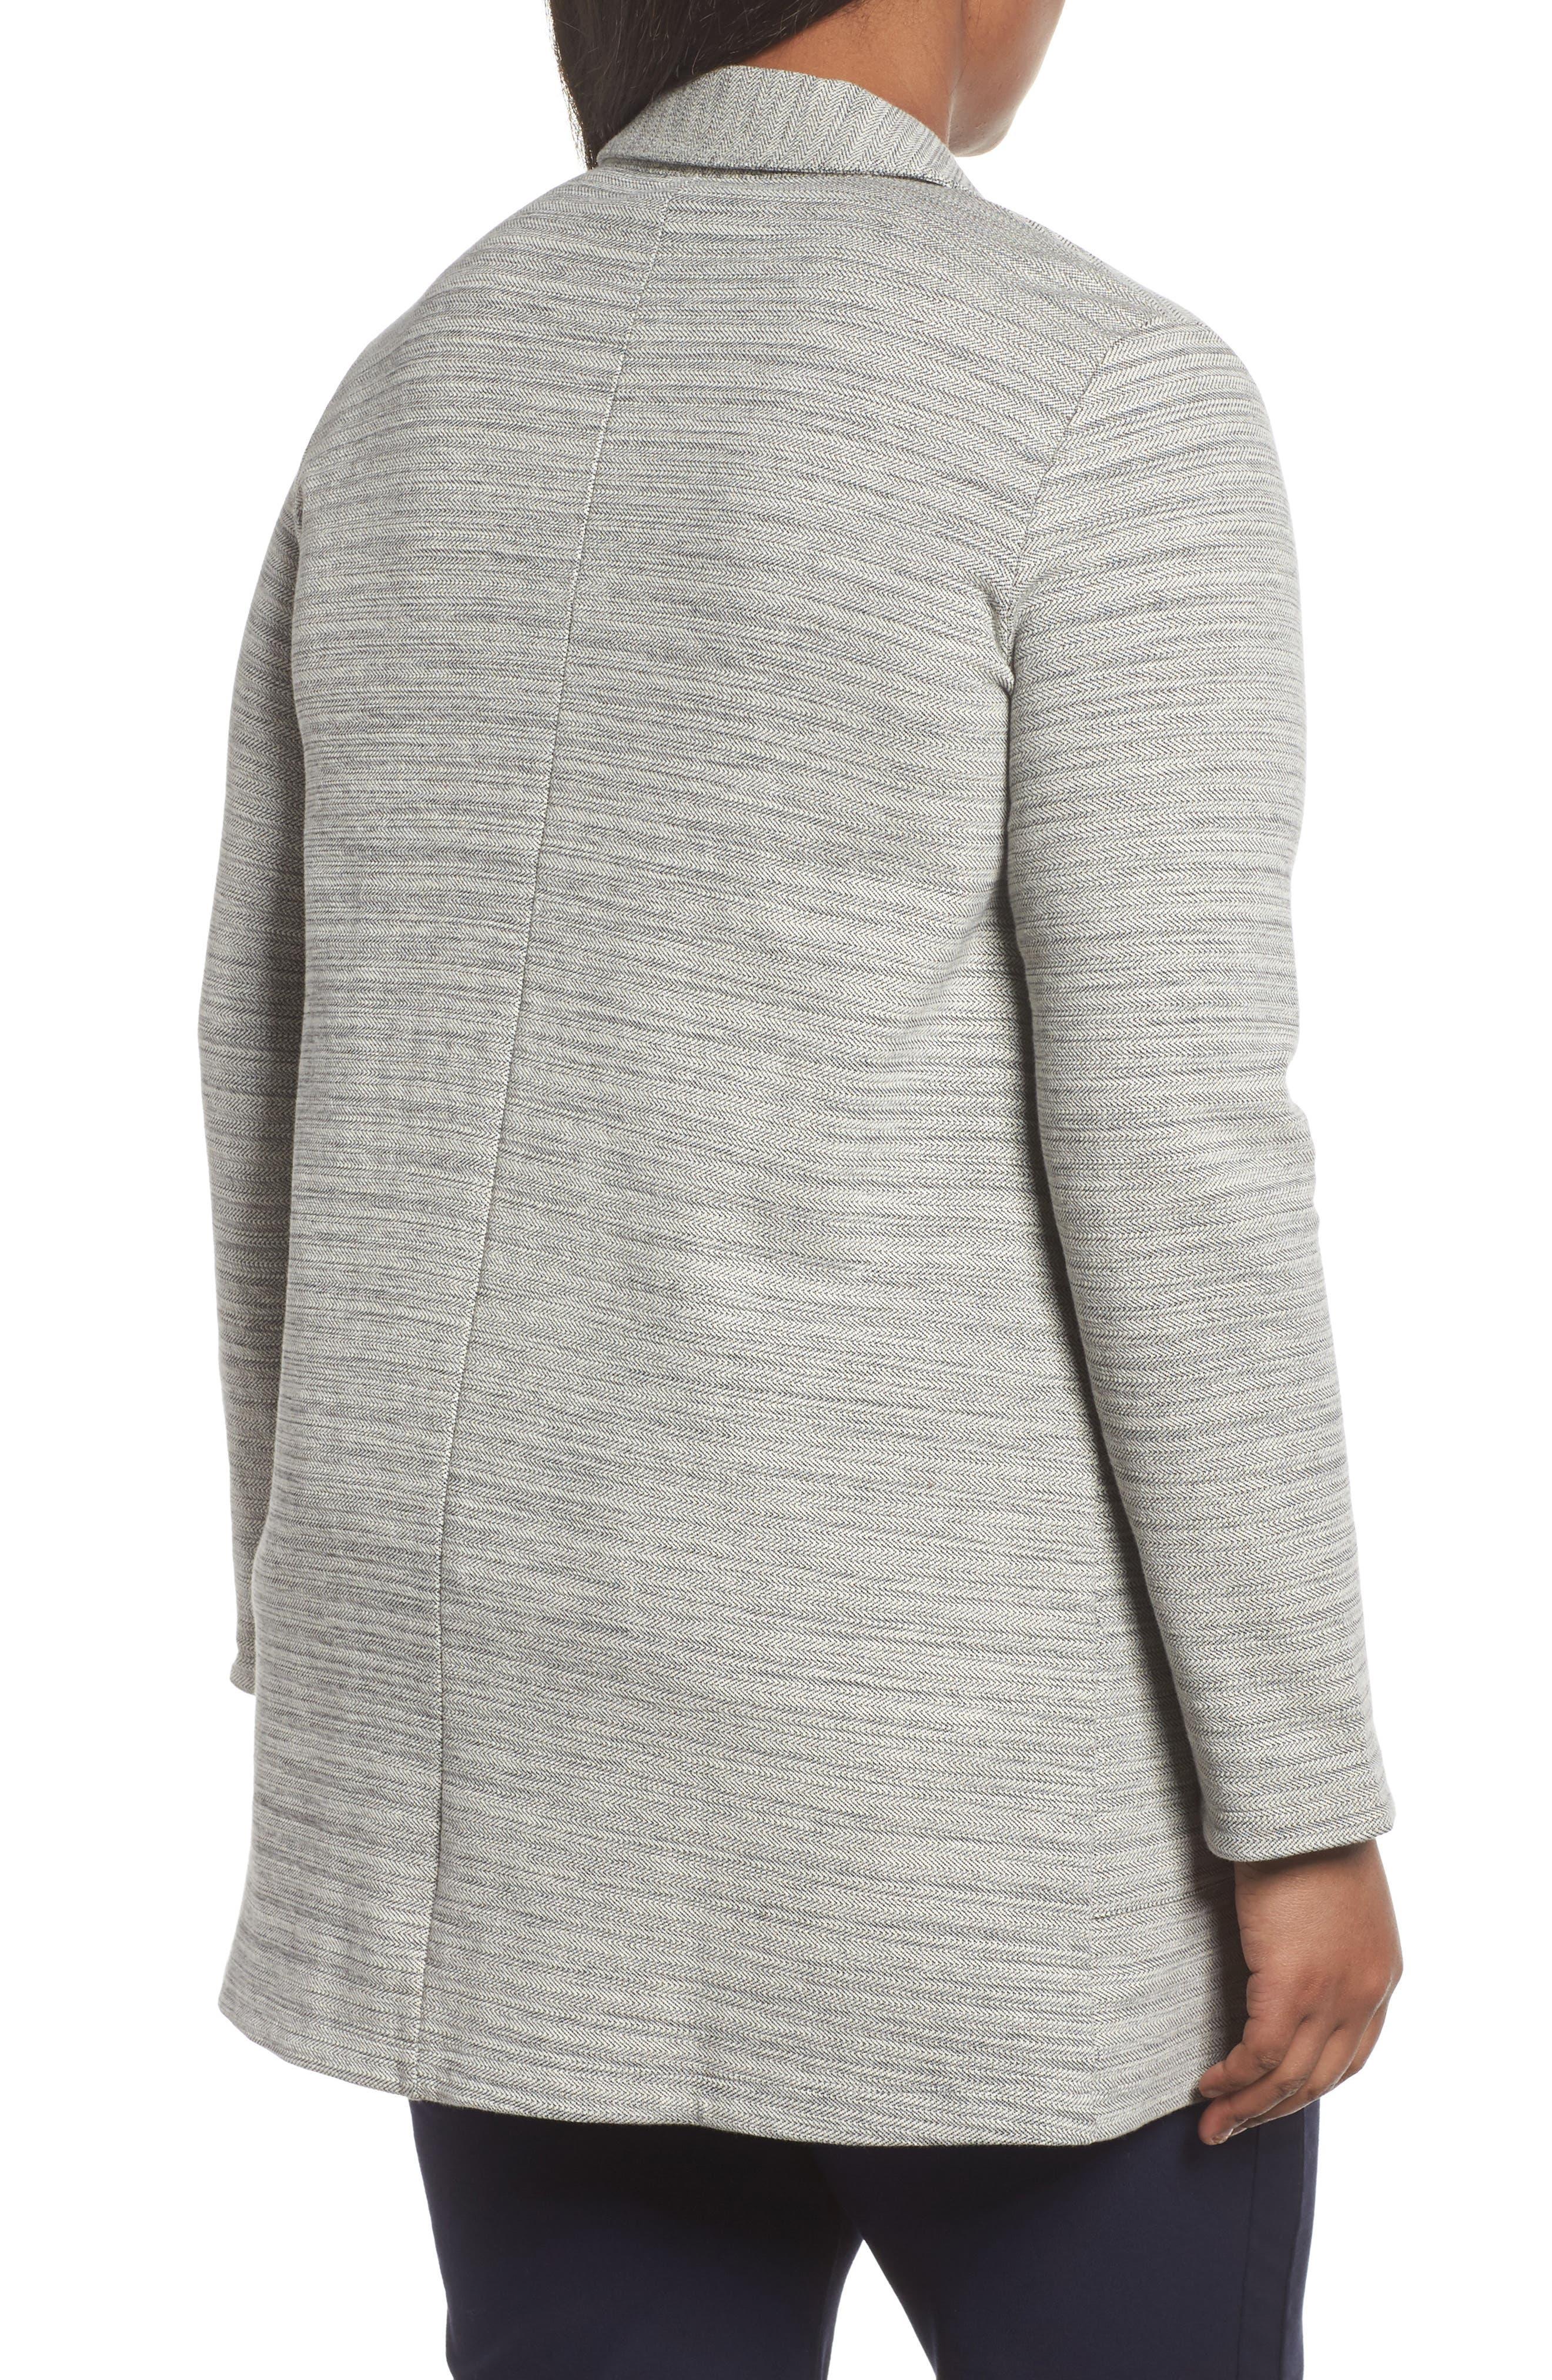 Cotton Blend Tweed Jacket,                             Alternate thumbnail 2, color,                             Dark Pearl